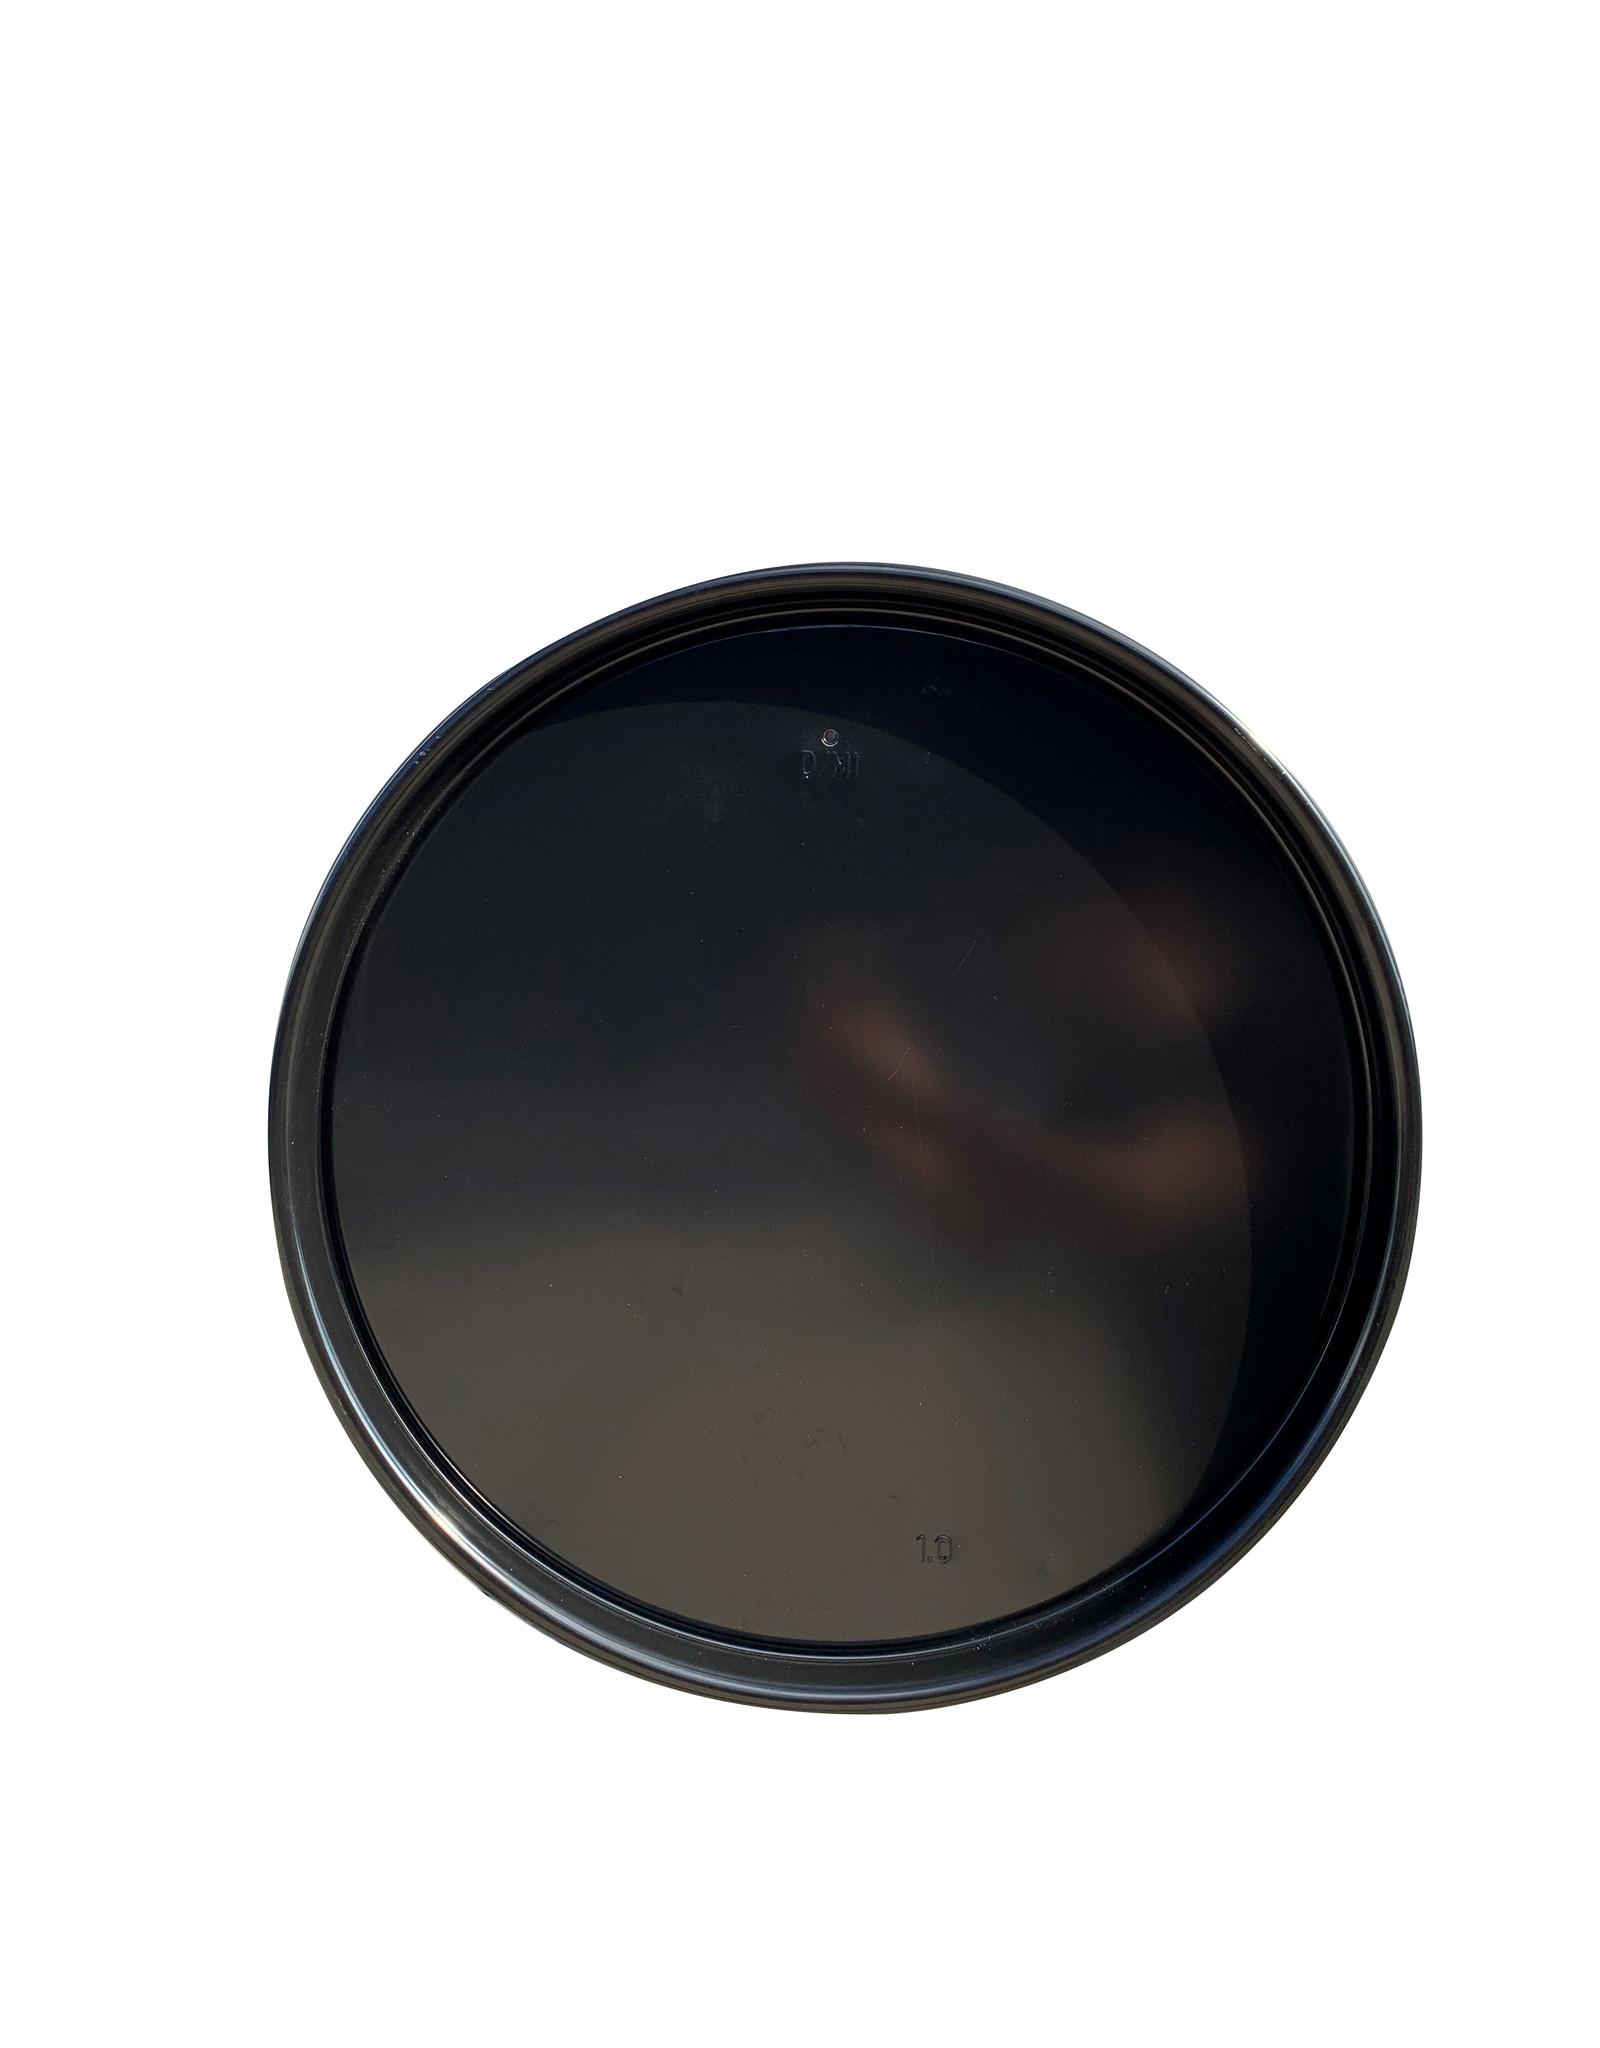 Barrelkings Industrieölfassdeckel Magnettafel- schwarzes Metall- 58 CM